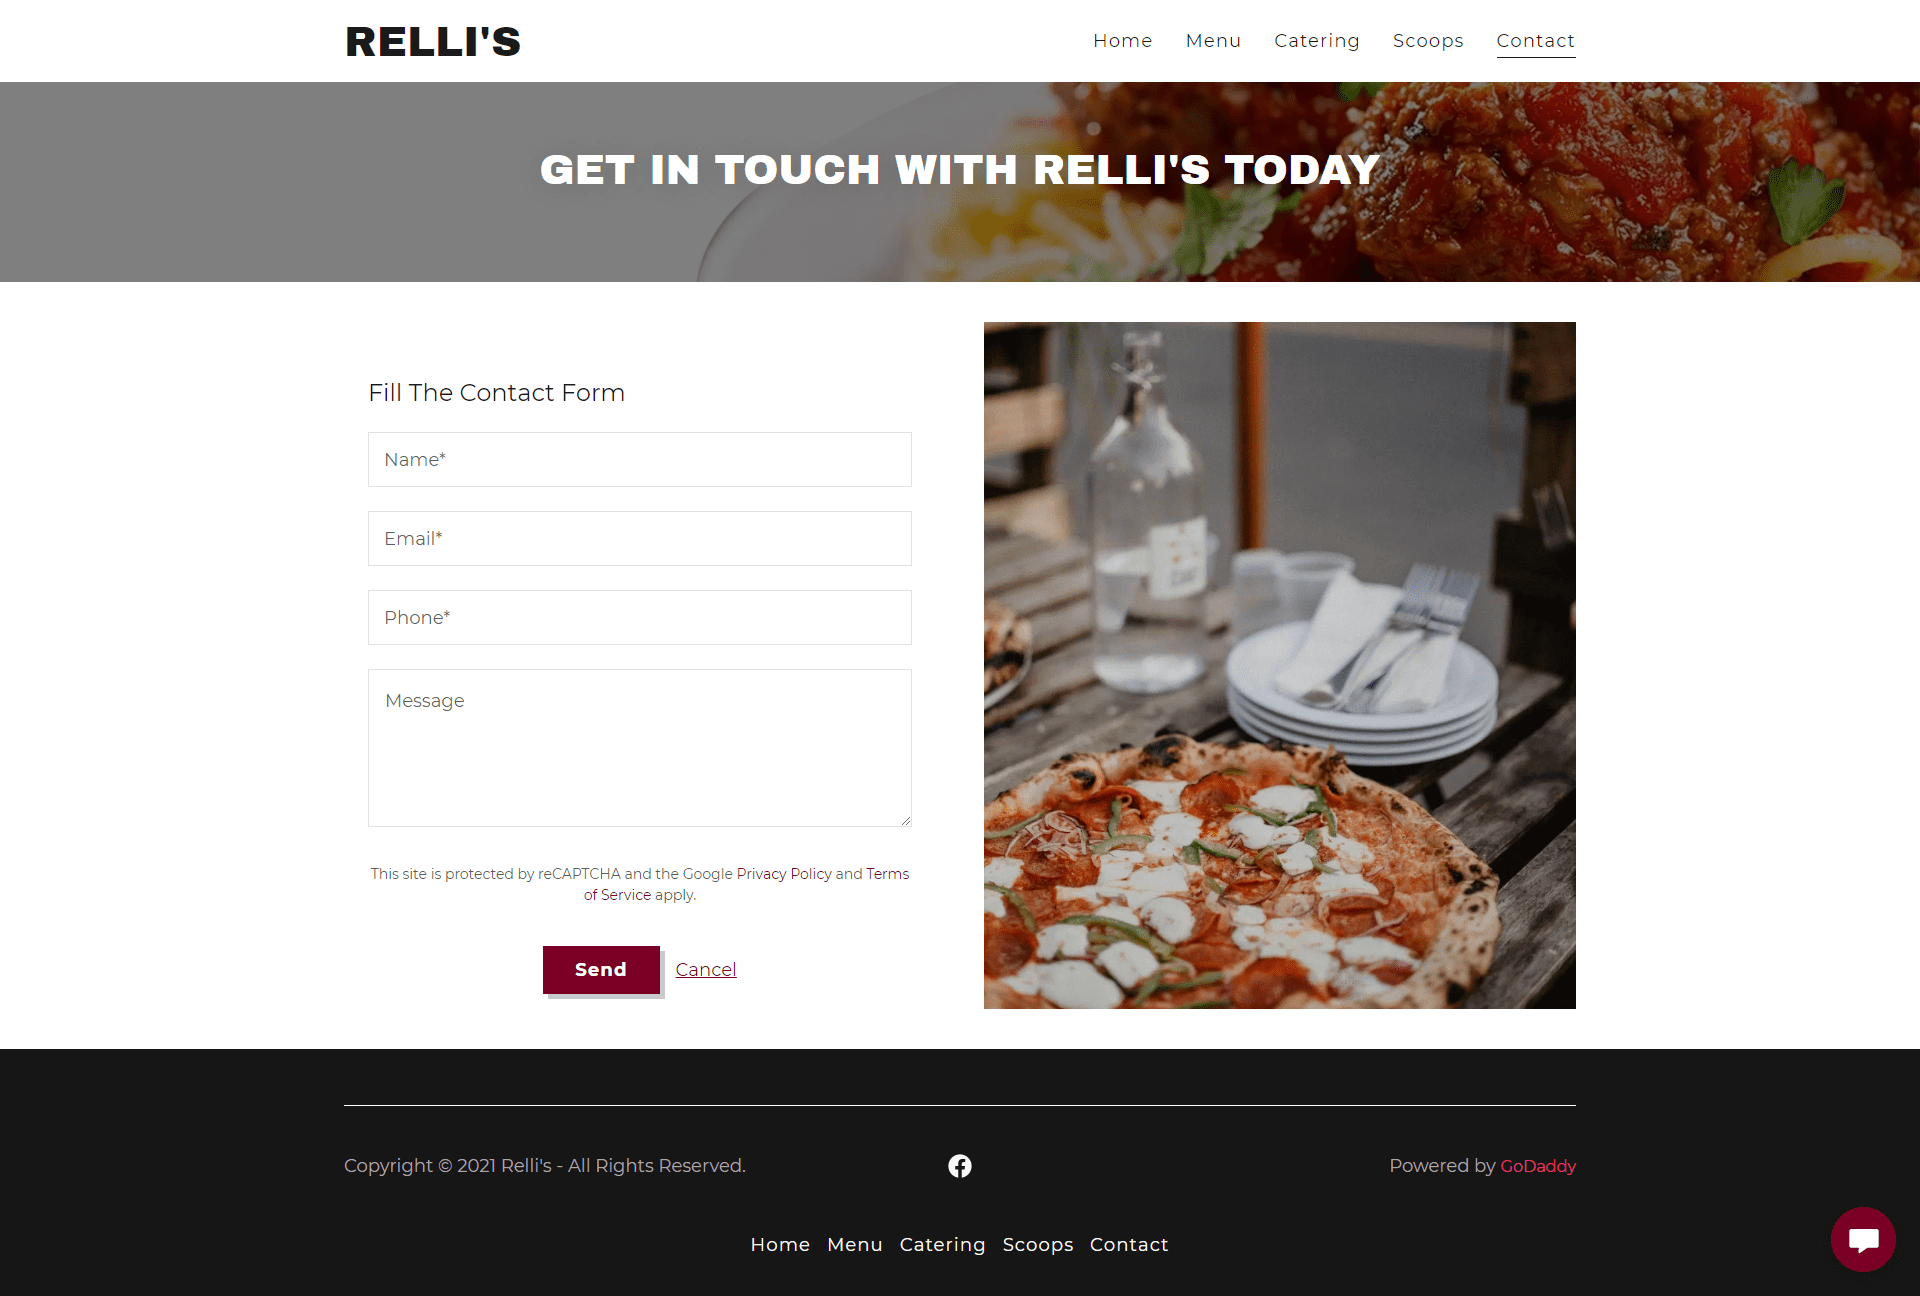 httpsrellis.godaddysites.com contact